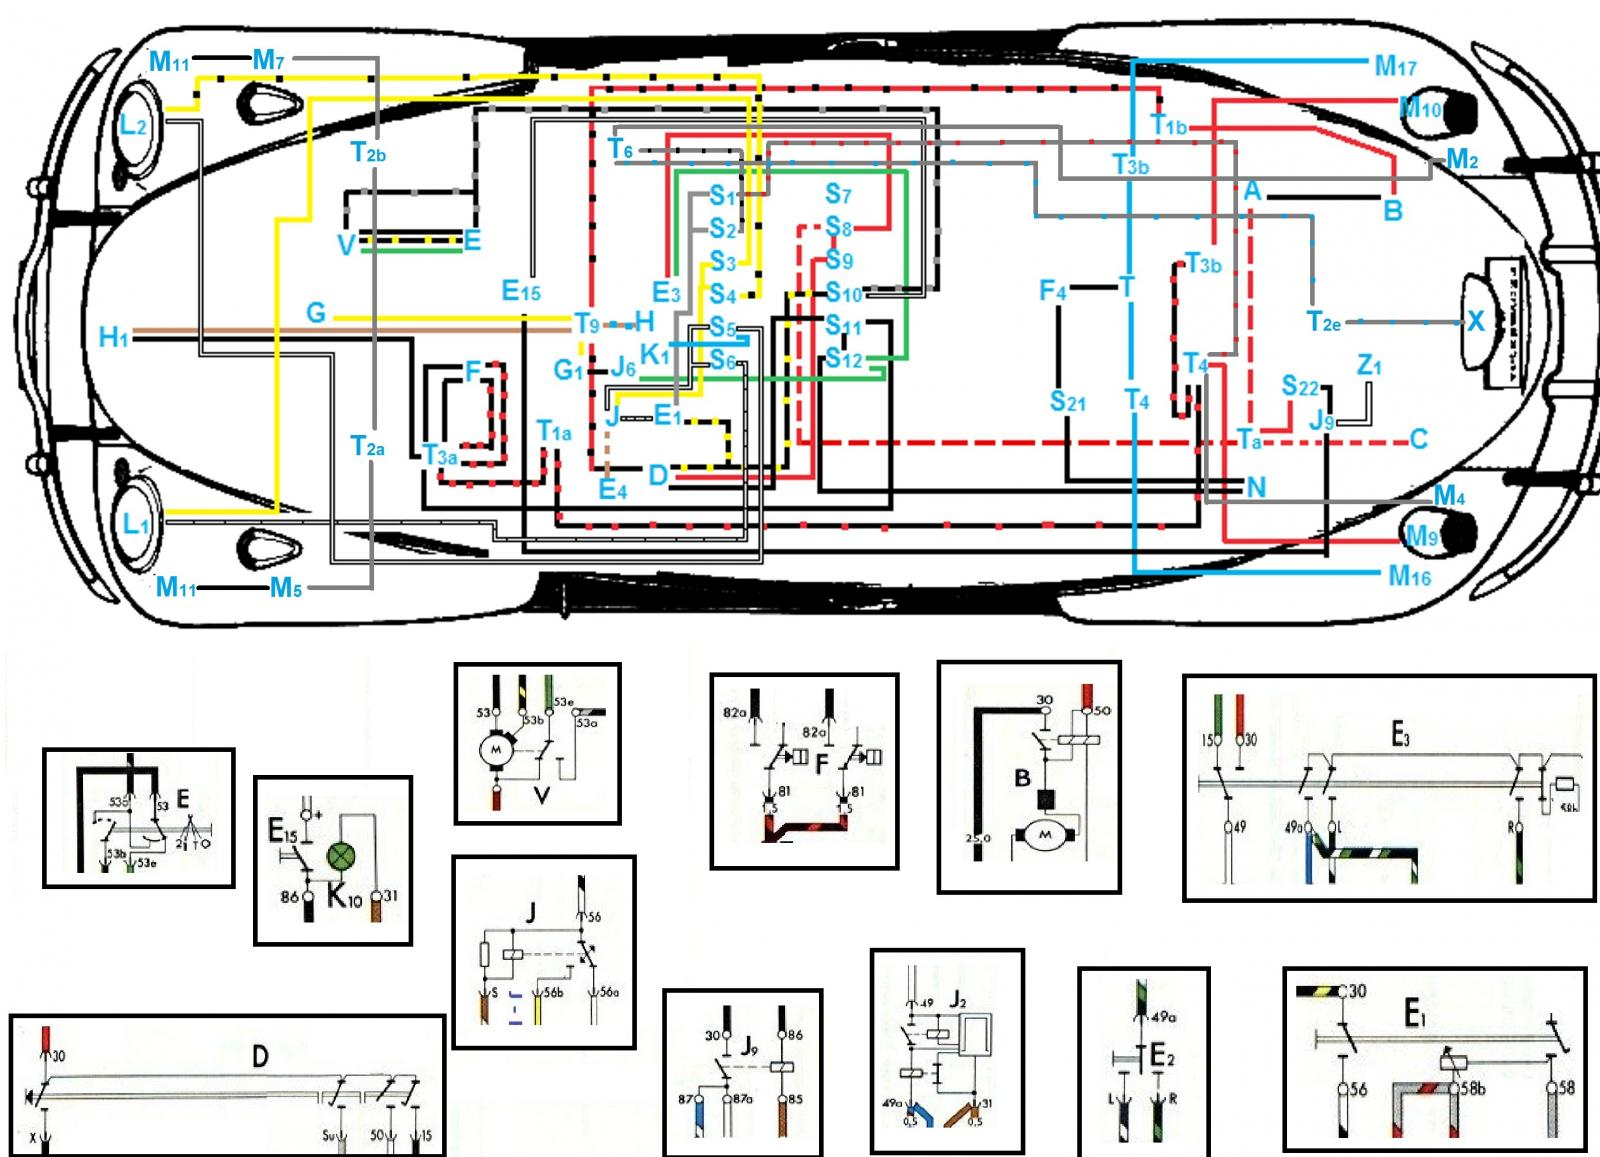 vw beetle diagram - wiring database diplomat agency-benefit -  agency-benefit.cantinabalares.it  cantina balares